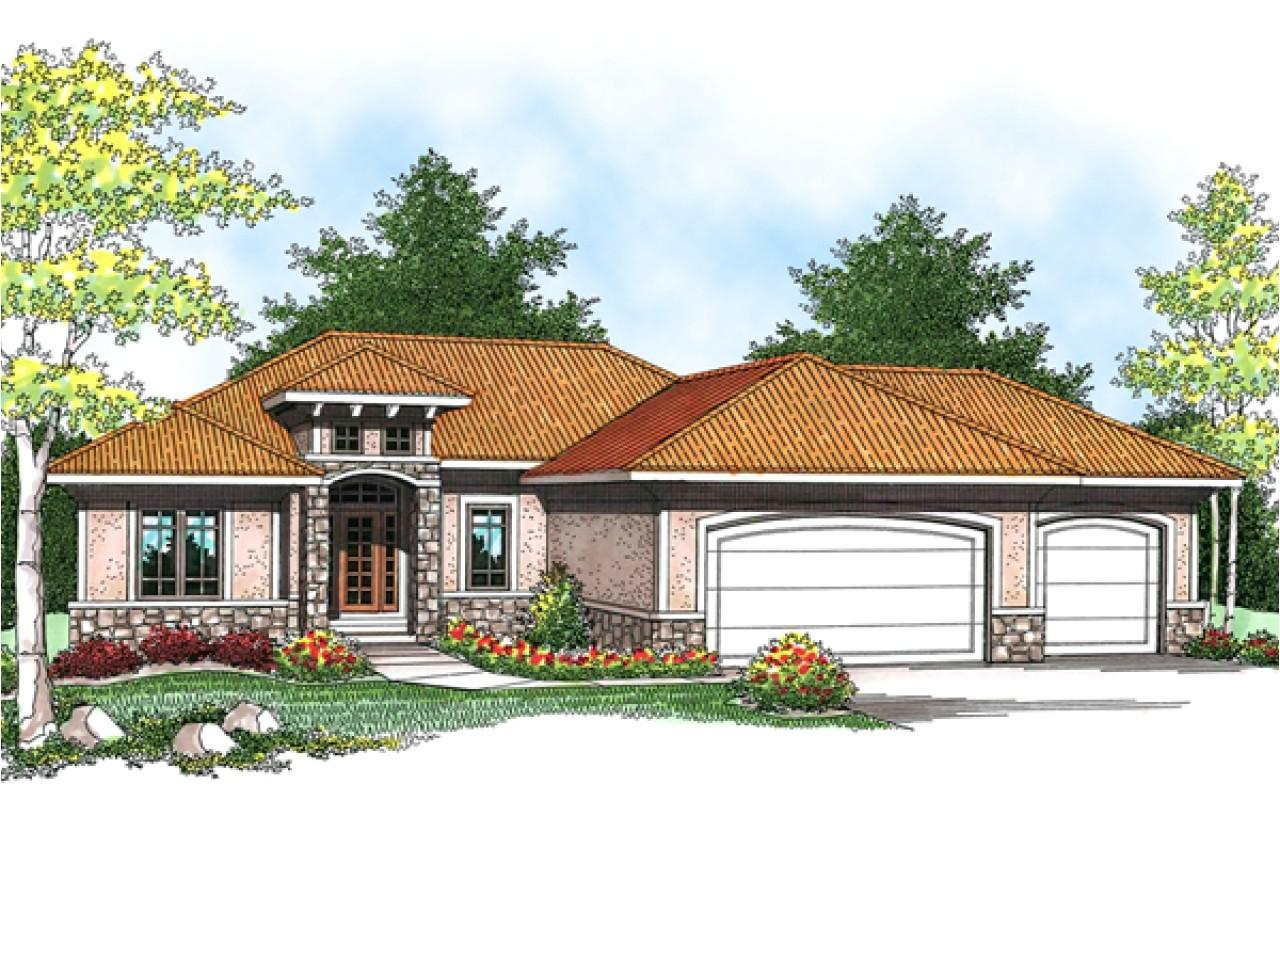 2978d414603d4467 victorian house plans stucco house plans and designs